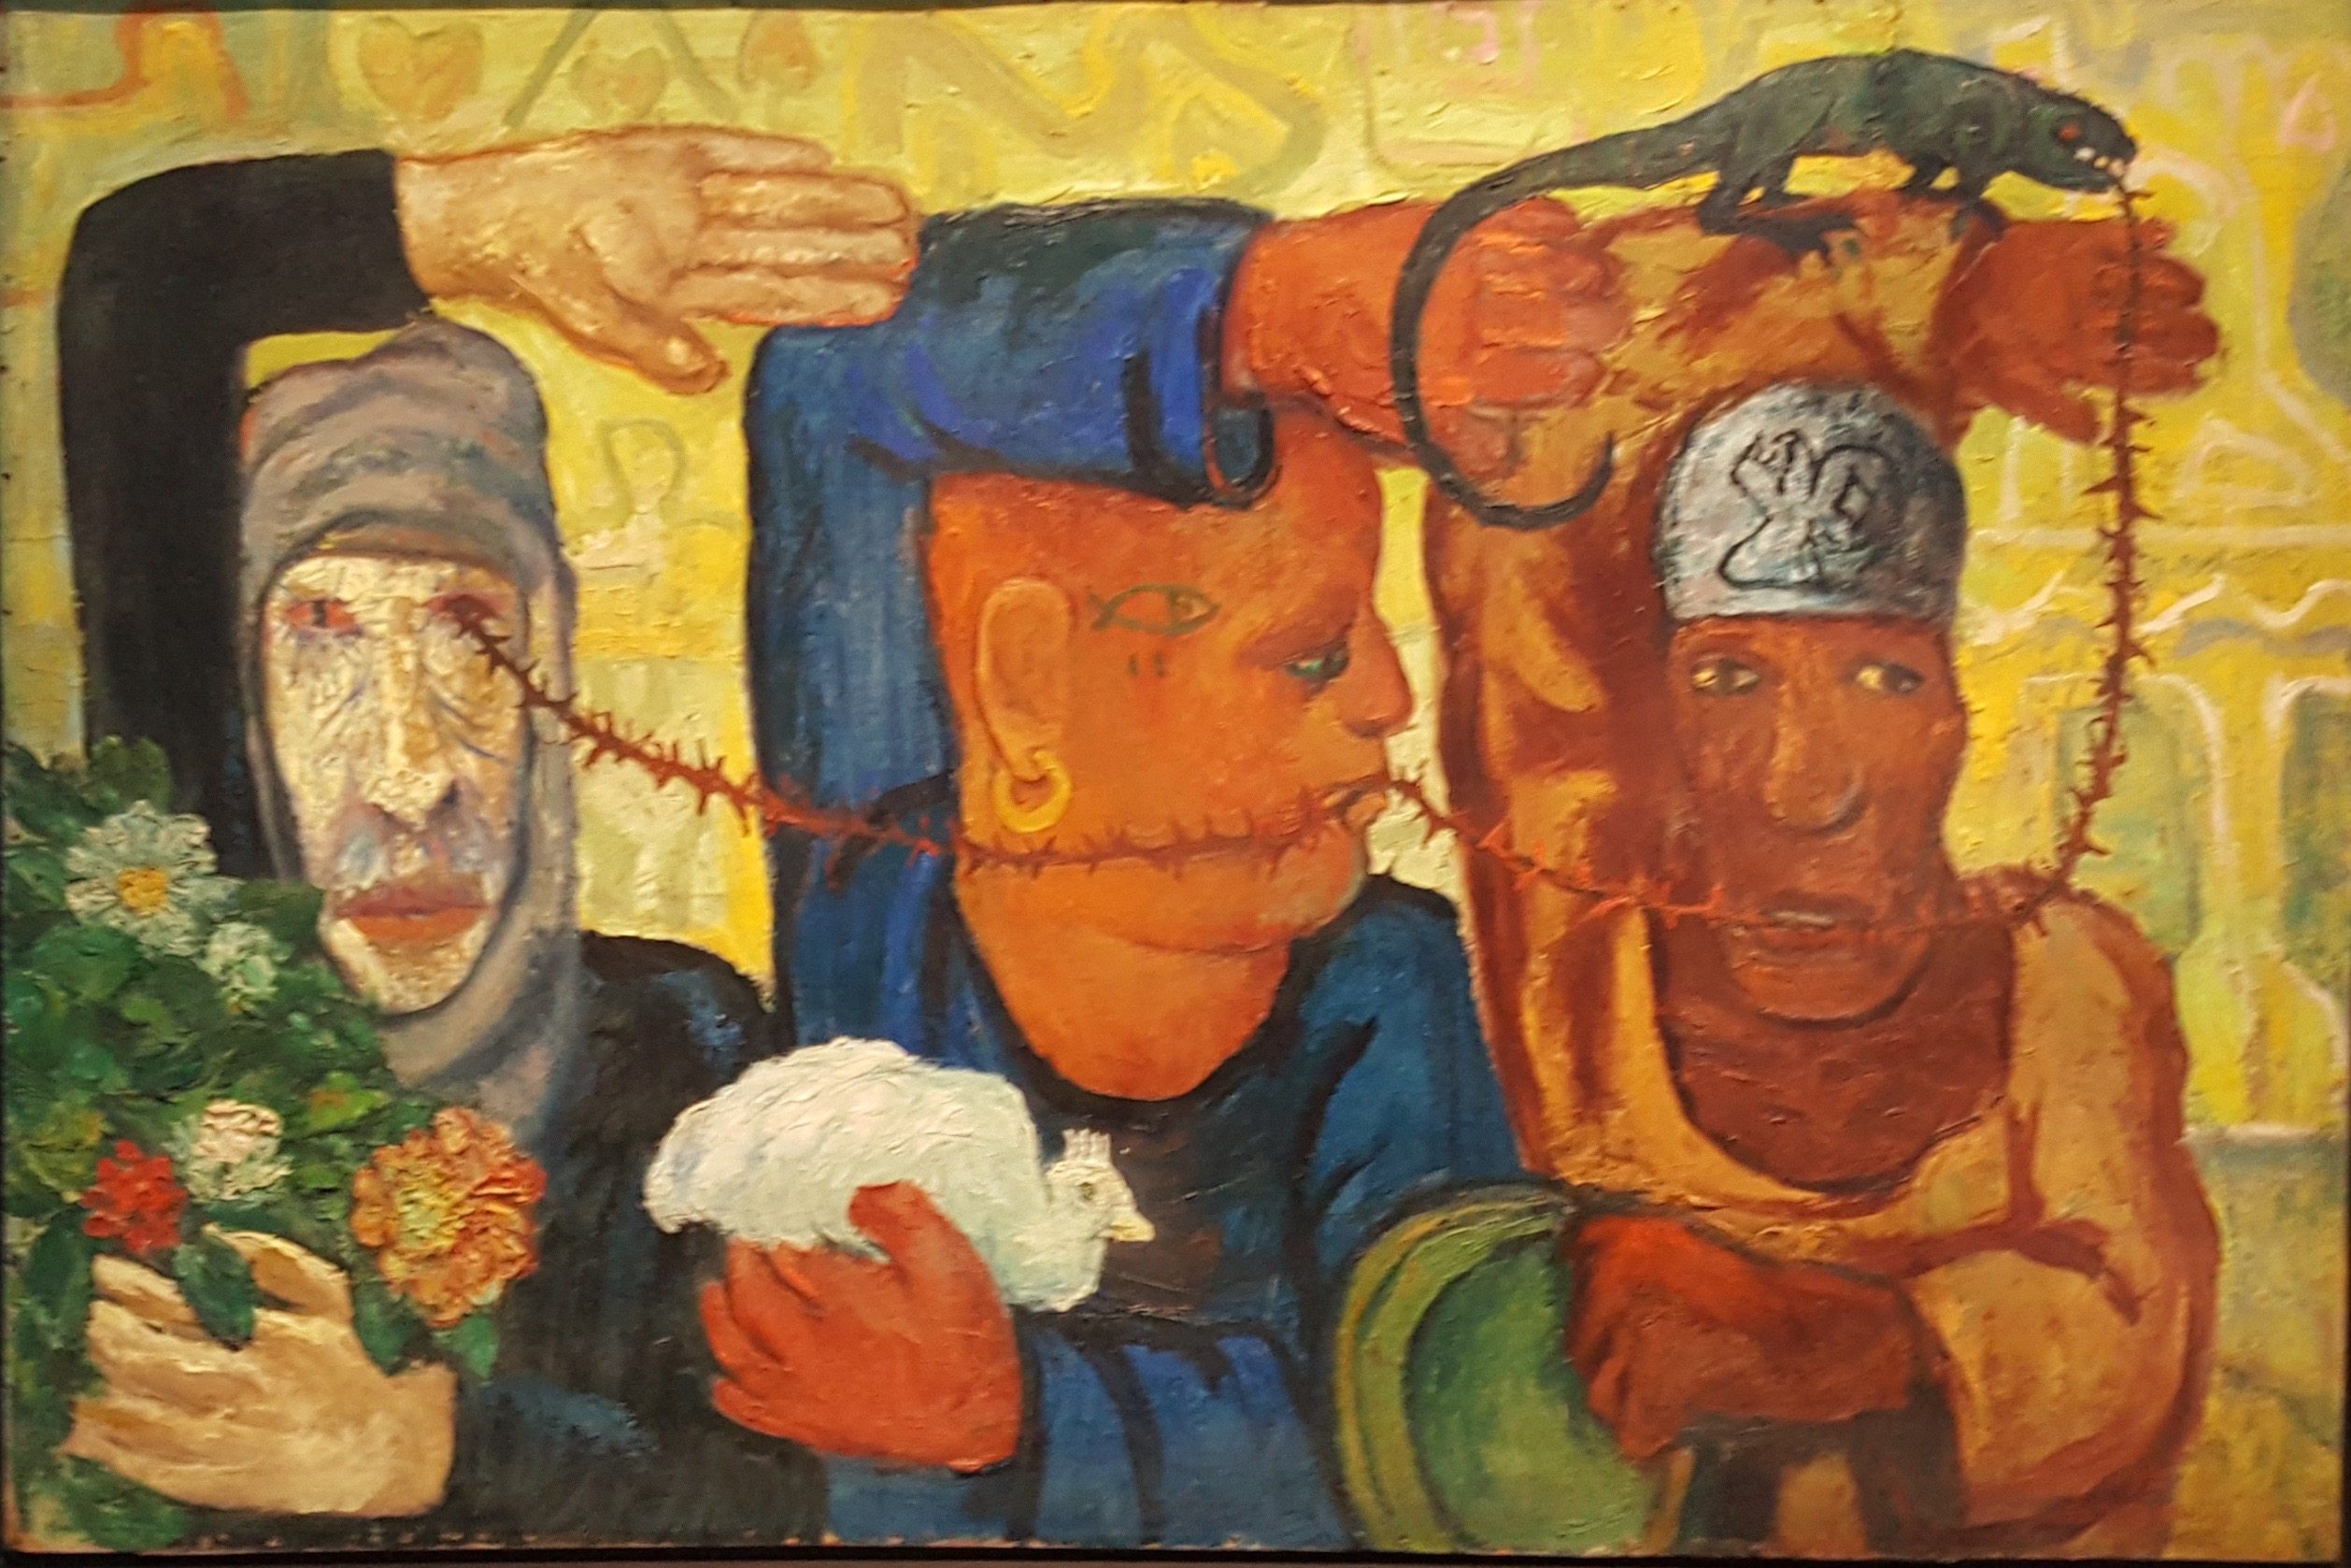 abdel-hadi-el-gazzar-mahassib-al-sayyida-1950dimartblogΚέντρο Πομπιντούegyptian_surrealism_banner2-jpg-webrend-1920-350van-leo7_groupe-art-et-liberteΑπό αριστερά προς τα δεξιά: Georges  Henein, Fuad Kamel, Ikbal El Alailly,  και Ramses Younan.img_2576Το λογότυπο του περιοδικού Al-Tatawwur, 1940Από τον κατάλογο της πρώτης έκθεσης της ομάδας, το 1940. Κείμενο του Henein, σχέδια του Fuad Kamel.Από τον κατάλογο της πρώτης έκθεσης της ομάδας, το 1940. Κείμενο του Henein, σχέδια του Fuad Kamel.Αφίσα της έκθεσης της ομάδας Contemporary Art Group,  1948 (Collection Leila Effat).7_la-seance-97_la-seance-87_artliberte-1Hassan El-Telmisani, Άτιτλο (recto-verso), ca. 1940Mayo, Coups de bâtons, 1937. (Image: © Annunciata Galleria, Milan)Mayo: Portrait, 1937, λάδι σε καμβά. Ευρωπαϊκό Πολιτιστικό Κέντρο Δελφών.Abdel Hadi El-Gazzar, Mahassib al-Sayyida, 1950Samir Rafi, Nu, 1945Ramses Younan, Untitled (1939) (Image: courtesy H. E. Sh. Hassan M. A. Al Thani collection, Doha)Rateb Seddik,Sans titre, 1940. Courtesy of Musee Rateb Seddik Le Caire.Ramses Younan, La Famille, 1938Fouad Kamel Moves of Lust, 1939Injy Efflatoun, Το κορίτσι και το Τέρας, 1941.Abdel Hadi el-Gazzar, Λαϊκή χορωδία, 1949 (Collection Naguib Sawiris).83surrealism-in-egypt978178453651097897742440569789774248597art-et-liberte-3-tt-width-653-height-368-lazyload-0-fill-0-crop-0-bgcolor-ffffffΤο dim/art στο facebookΤο dim/art στο twitterinstagram-logoimg_logo_bluebg_2x